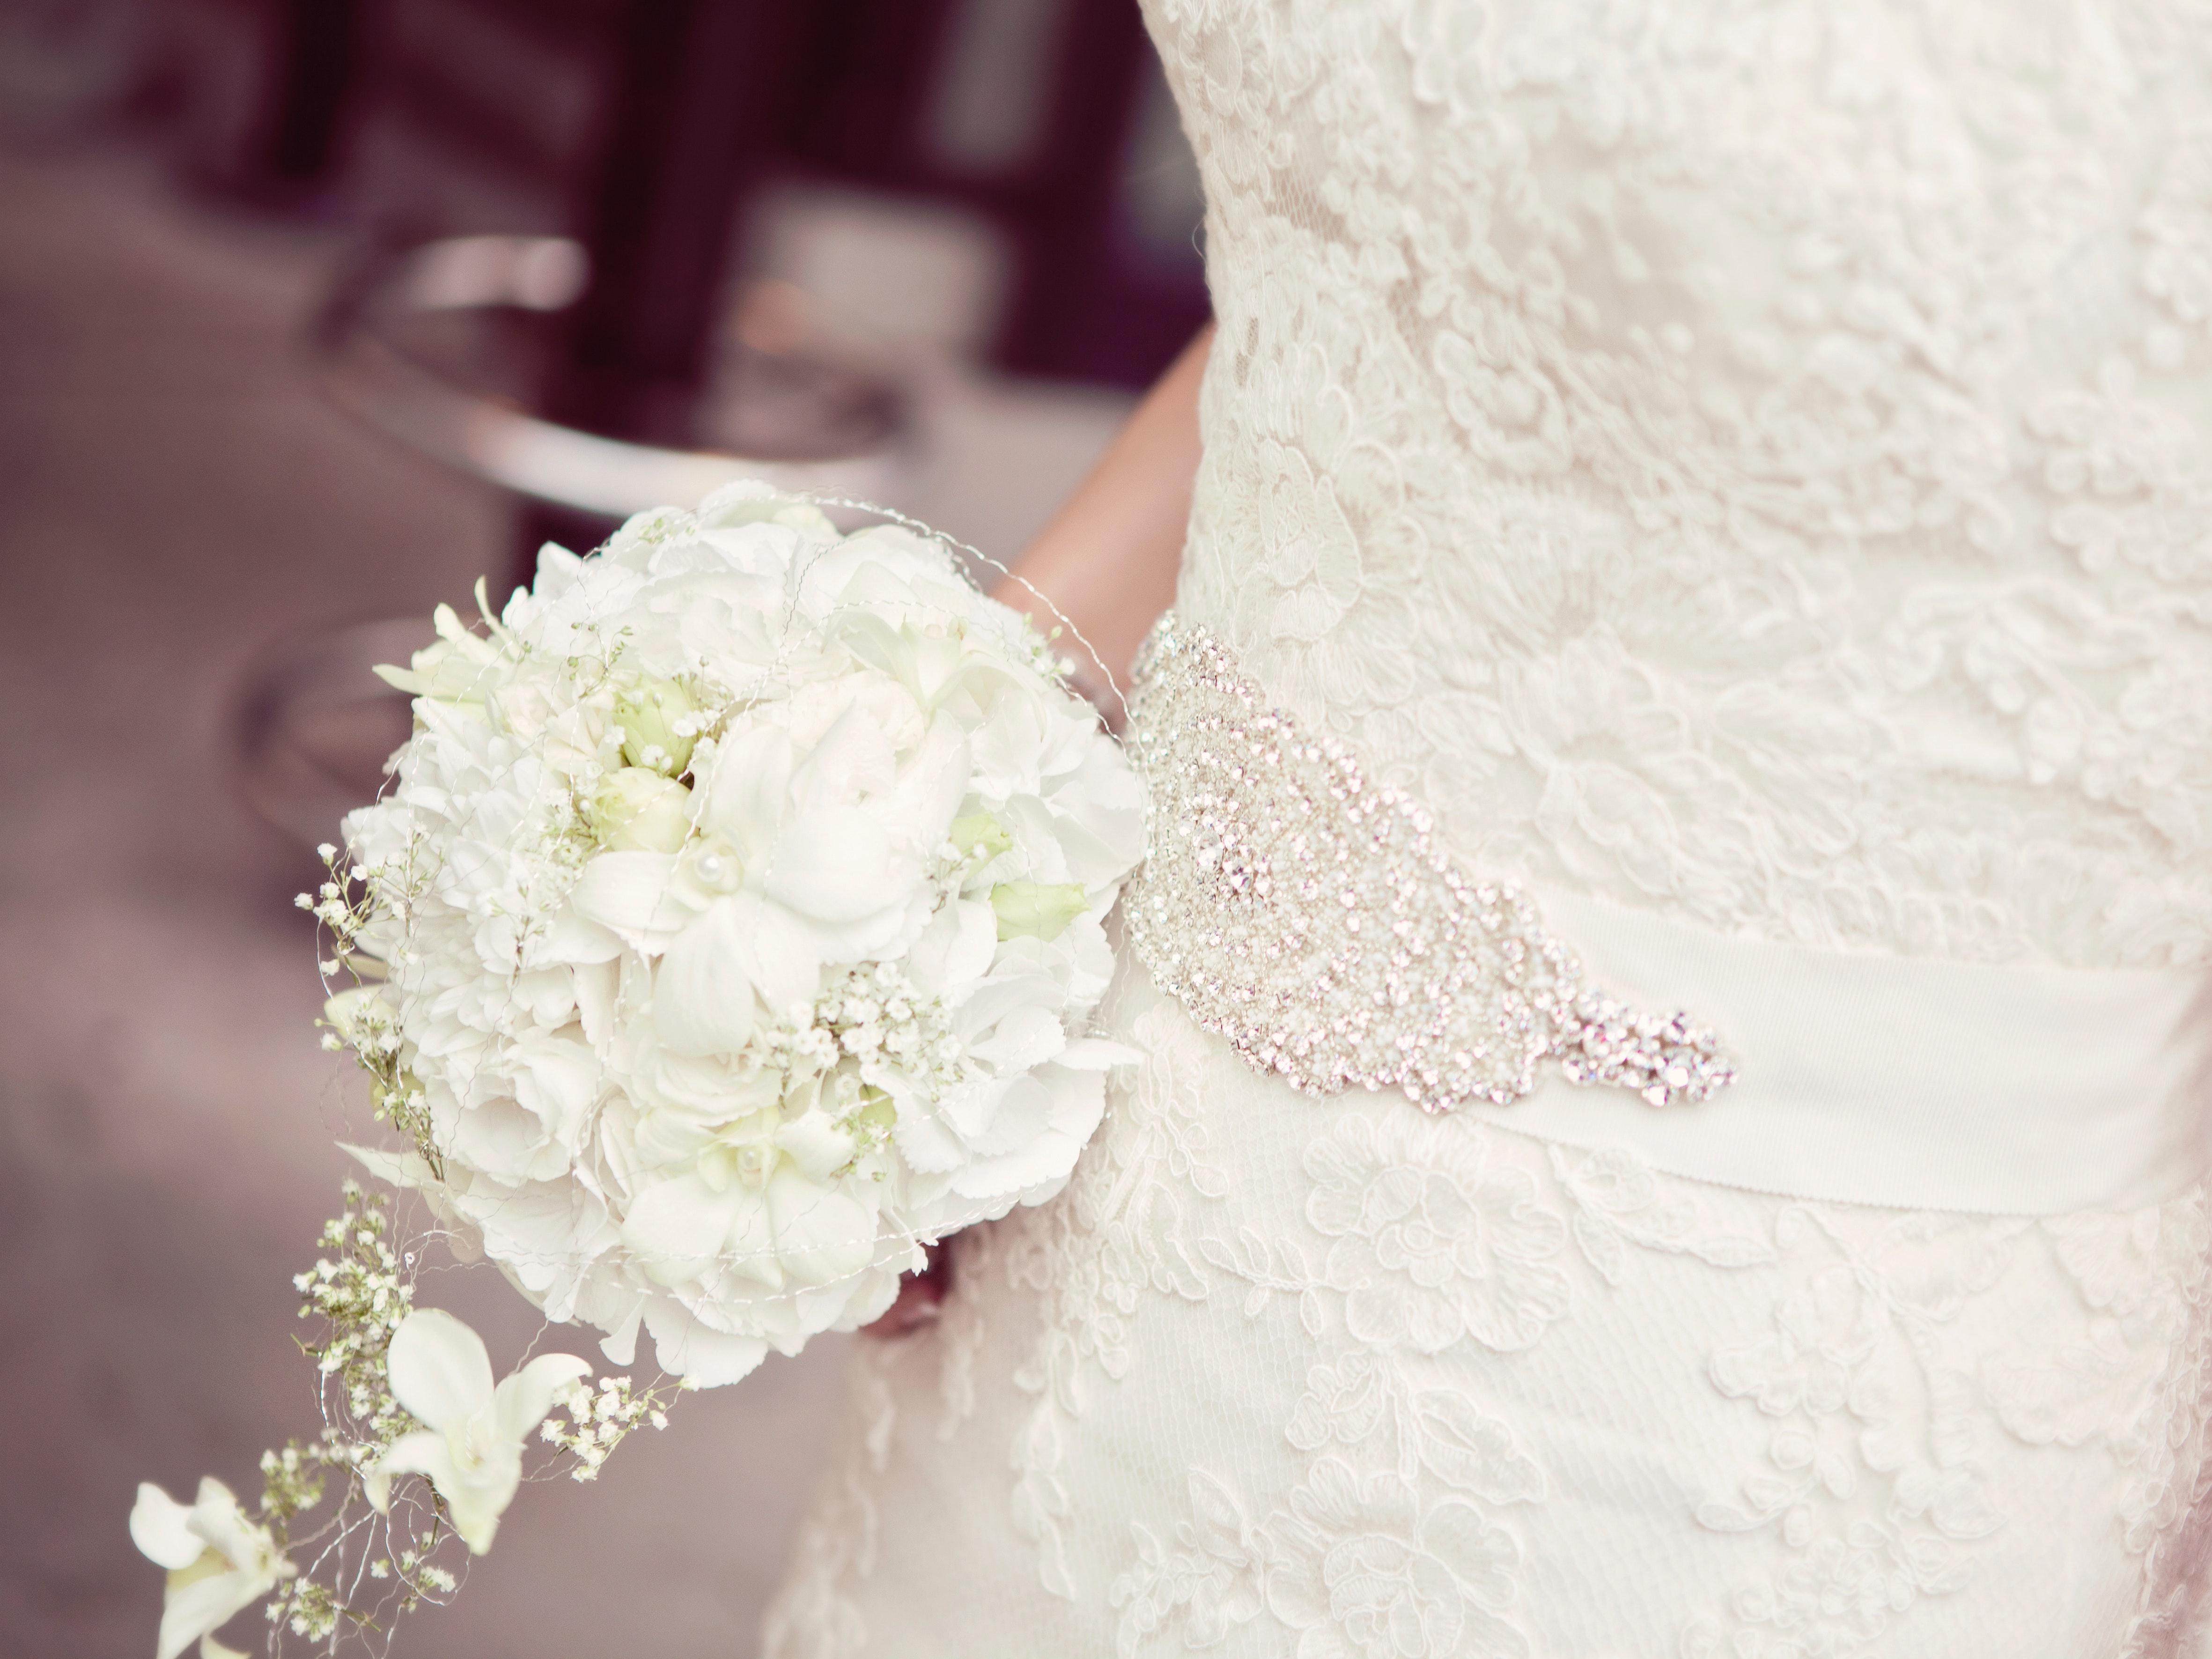 Woman carrying wedding flower photo